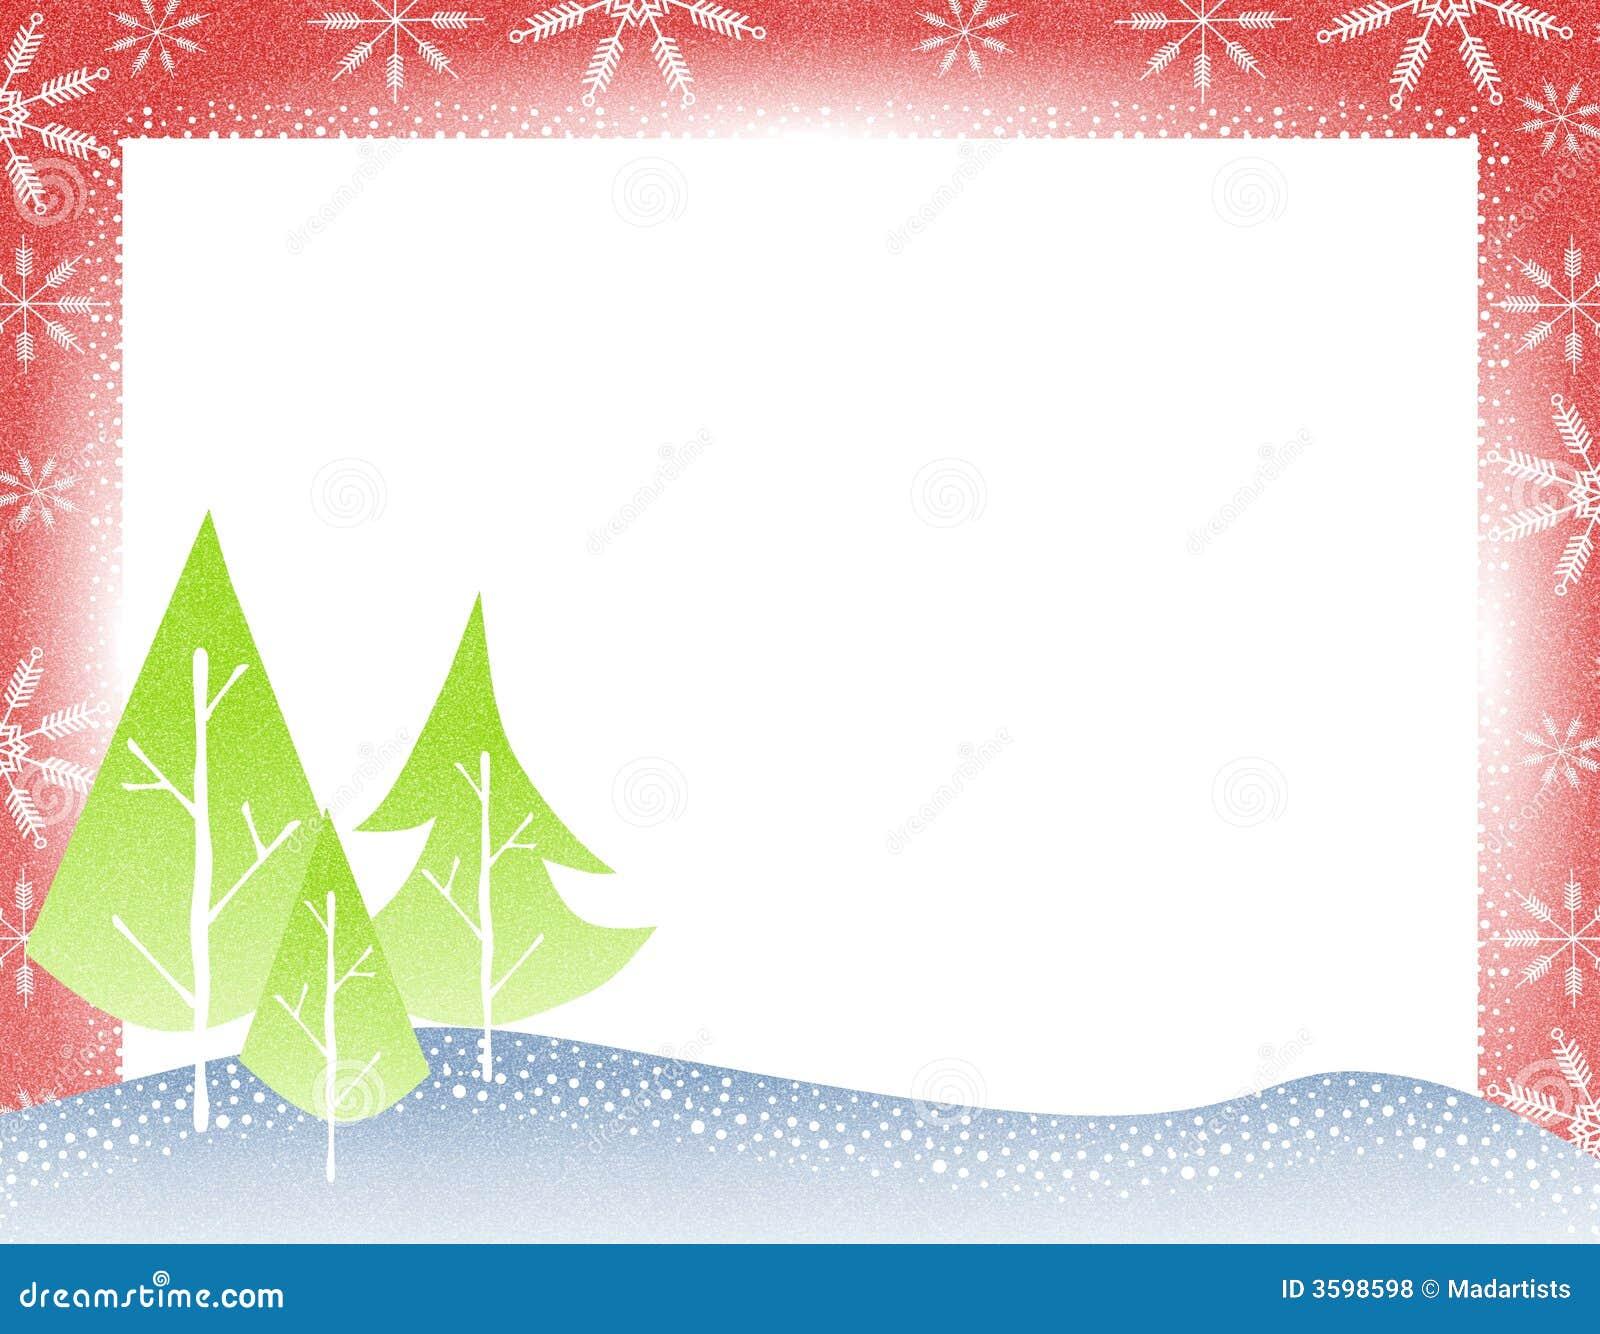 Rustic christmas tree border stock illustration